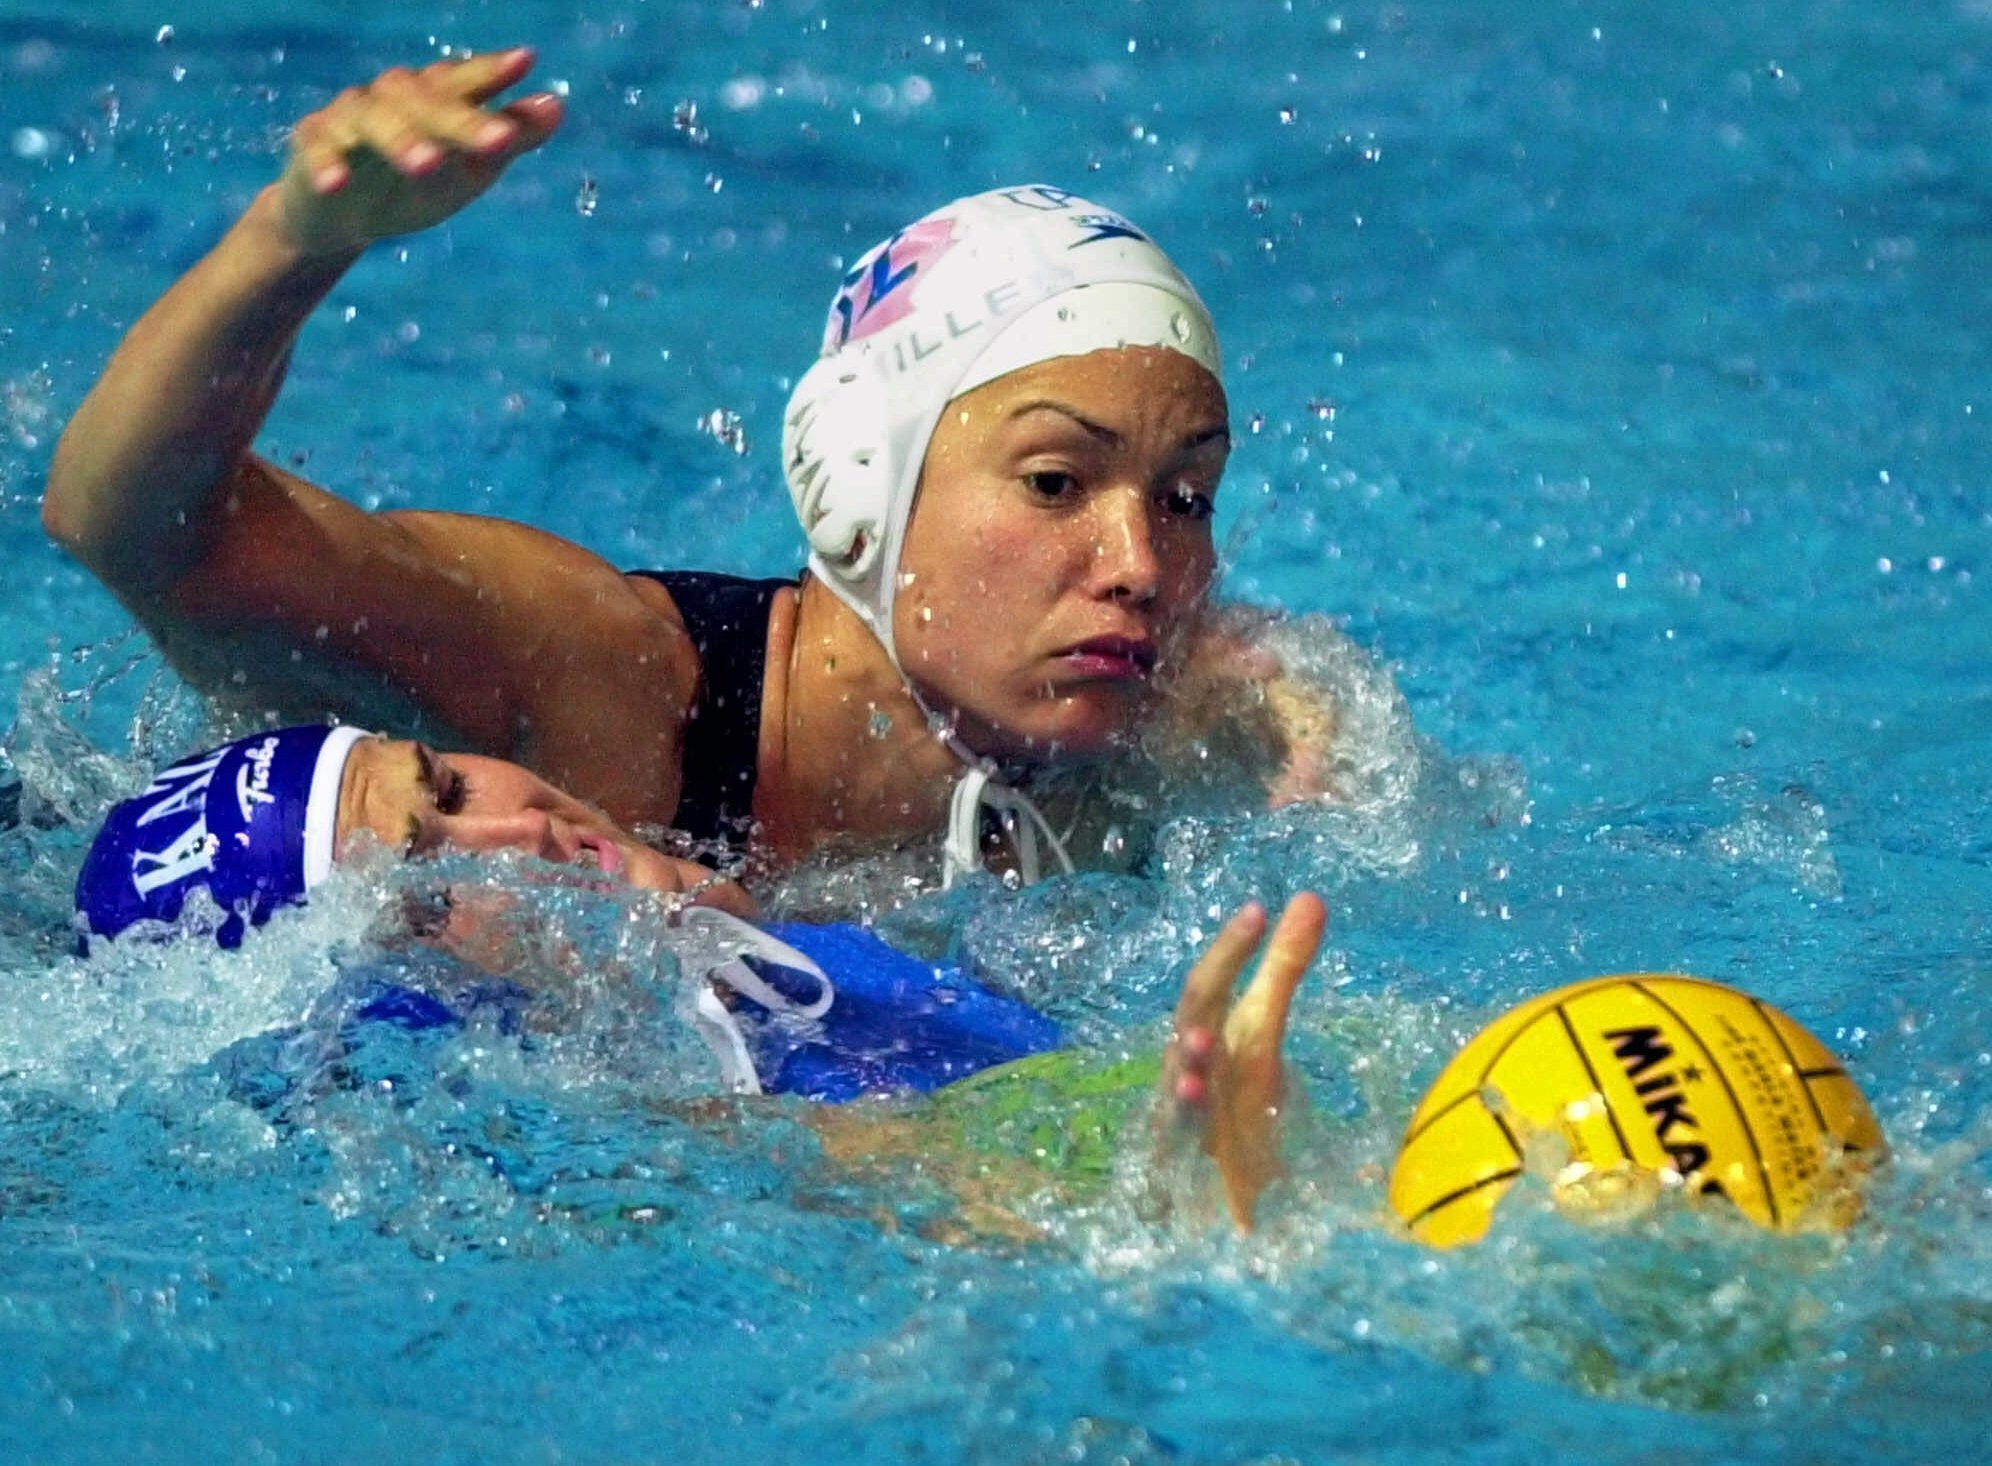 Waneek Horn-Miller reaches for the ball while battling defender